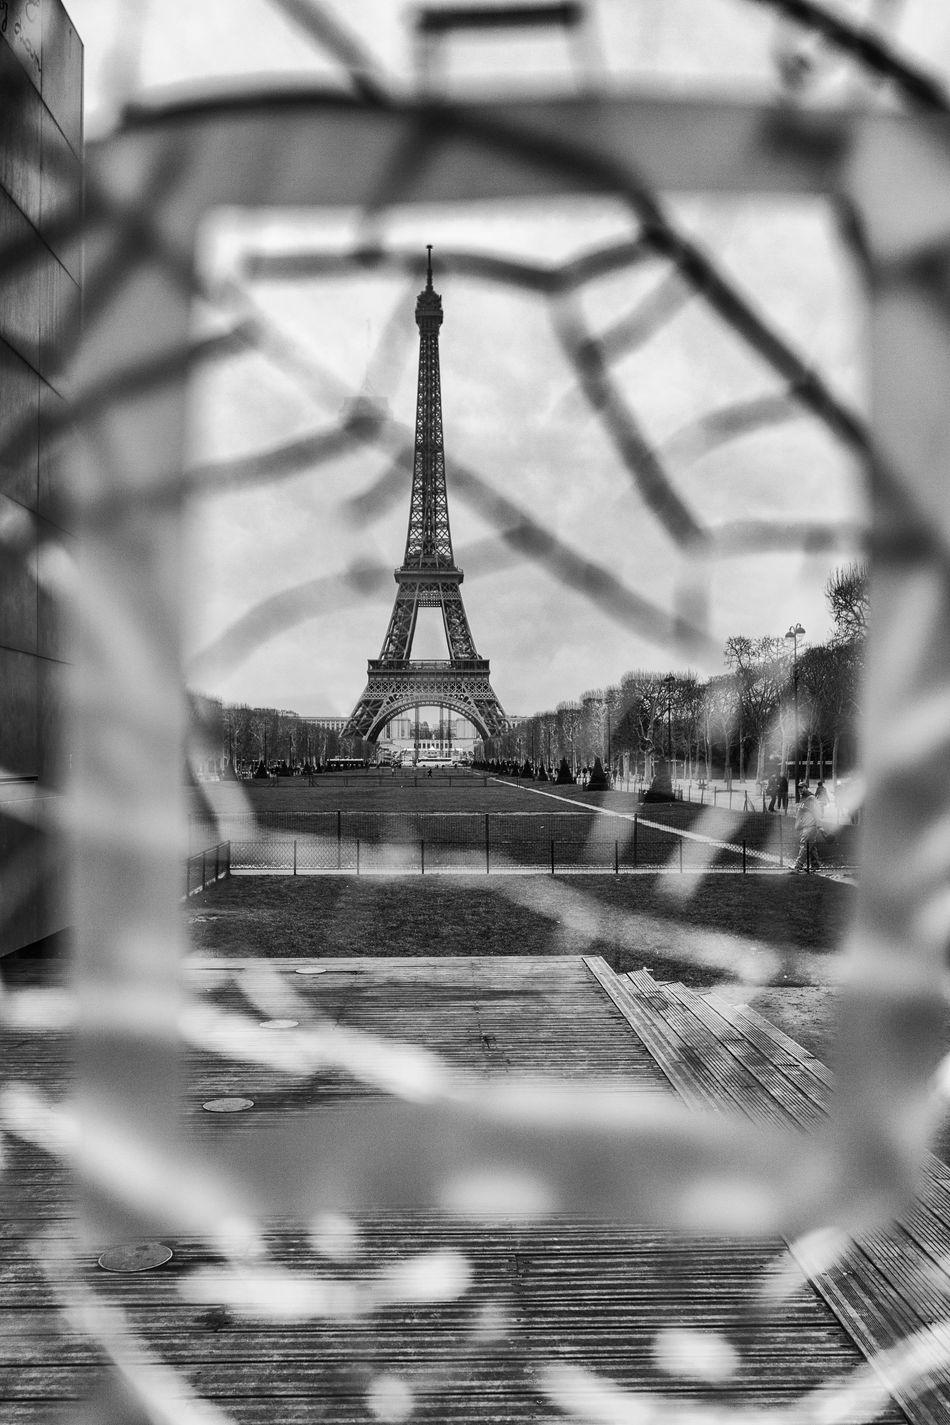 Architecture Black & White Black And White Black And White Photography Building Exterior City No People Outdoors Paris Paris, France  Tour Eiffel Tour Eiffel Black And White Tour Eiffel, Paris. Tower